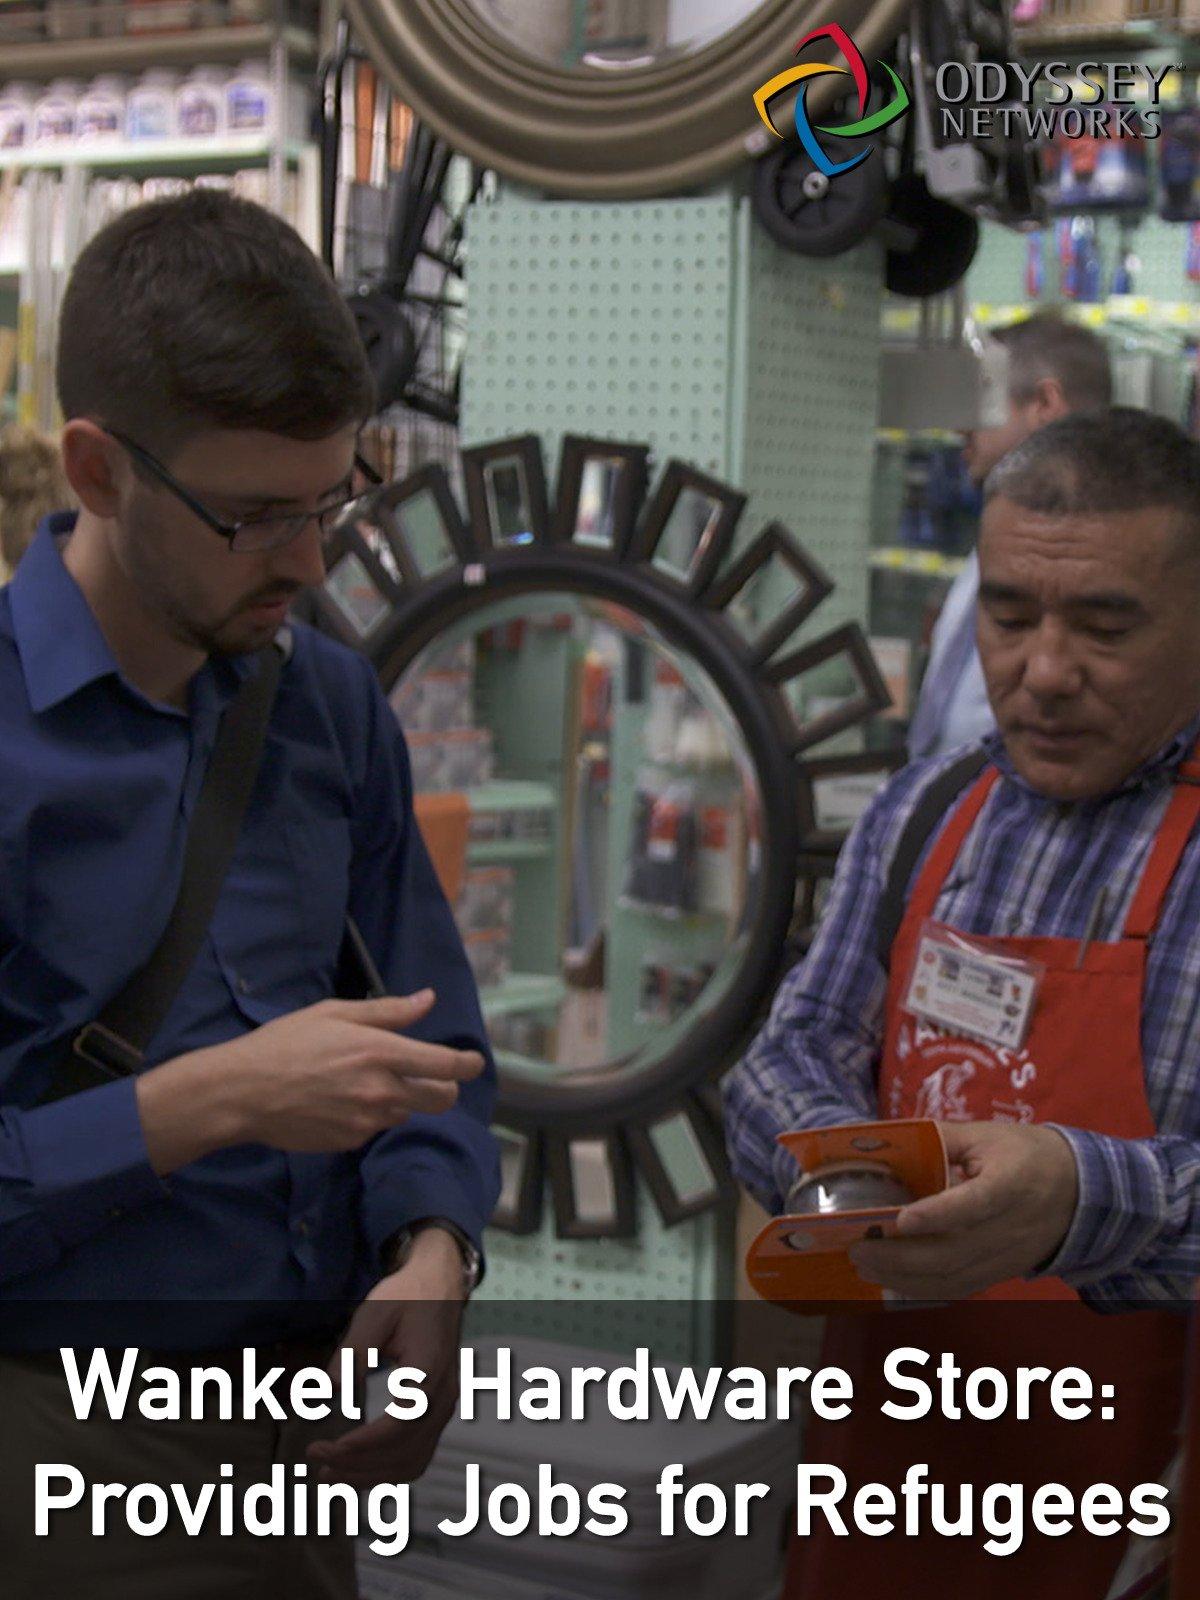 Clip: Wankel's Hardware Store: Providing Jobs for Refugees